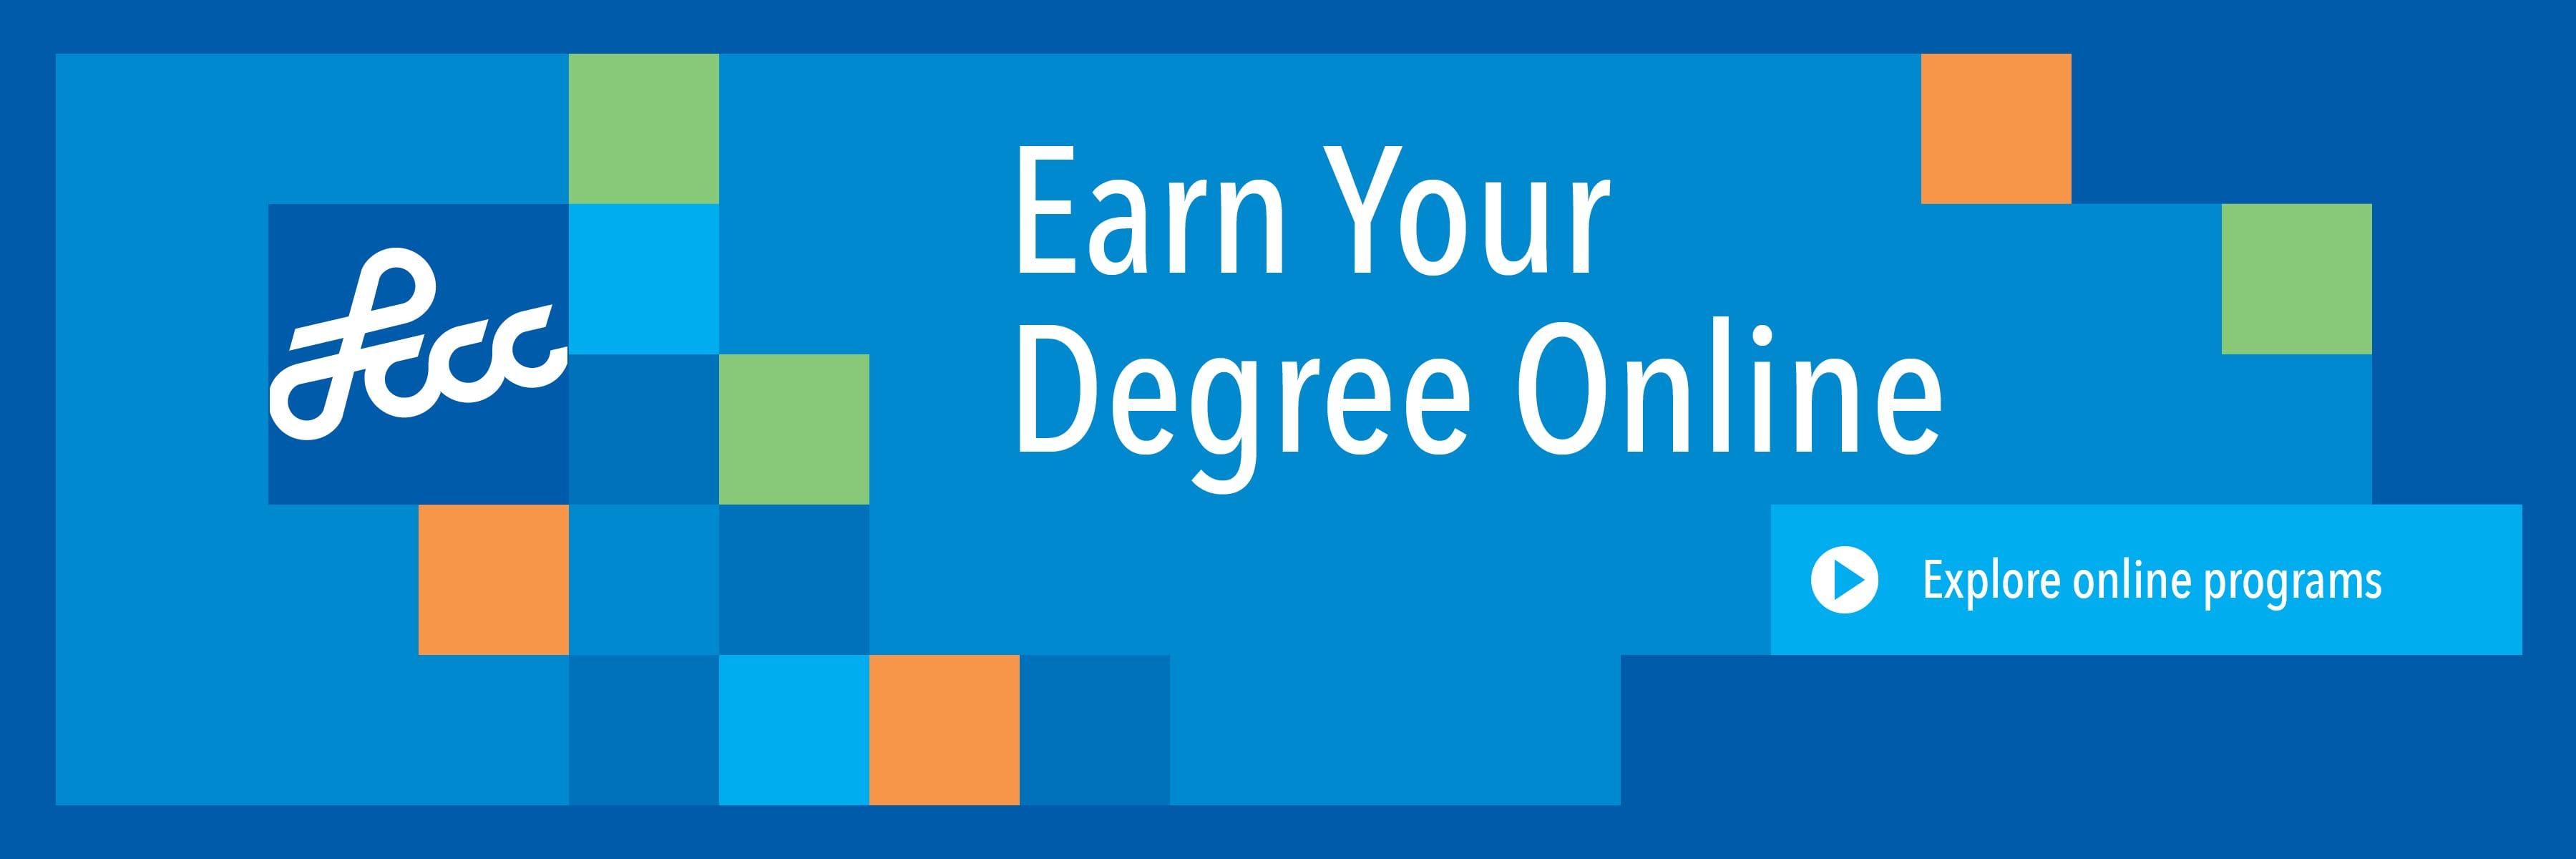 Earn your degree online. Explore online programs.